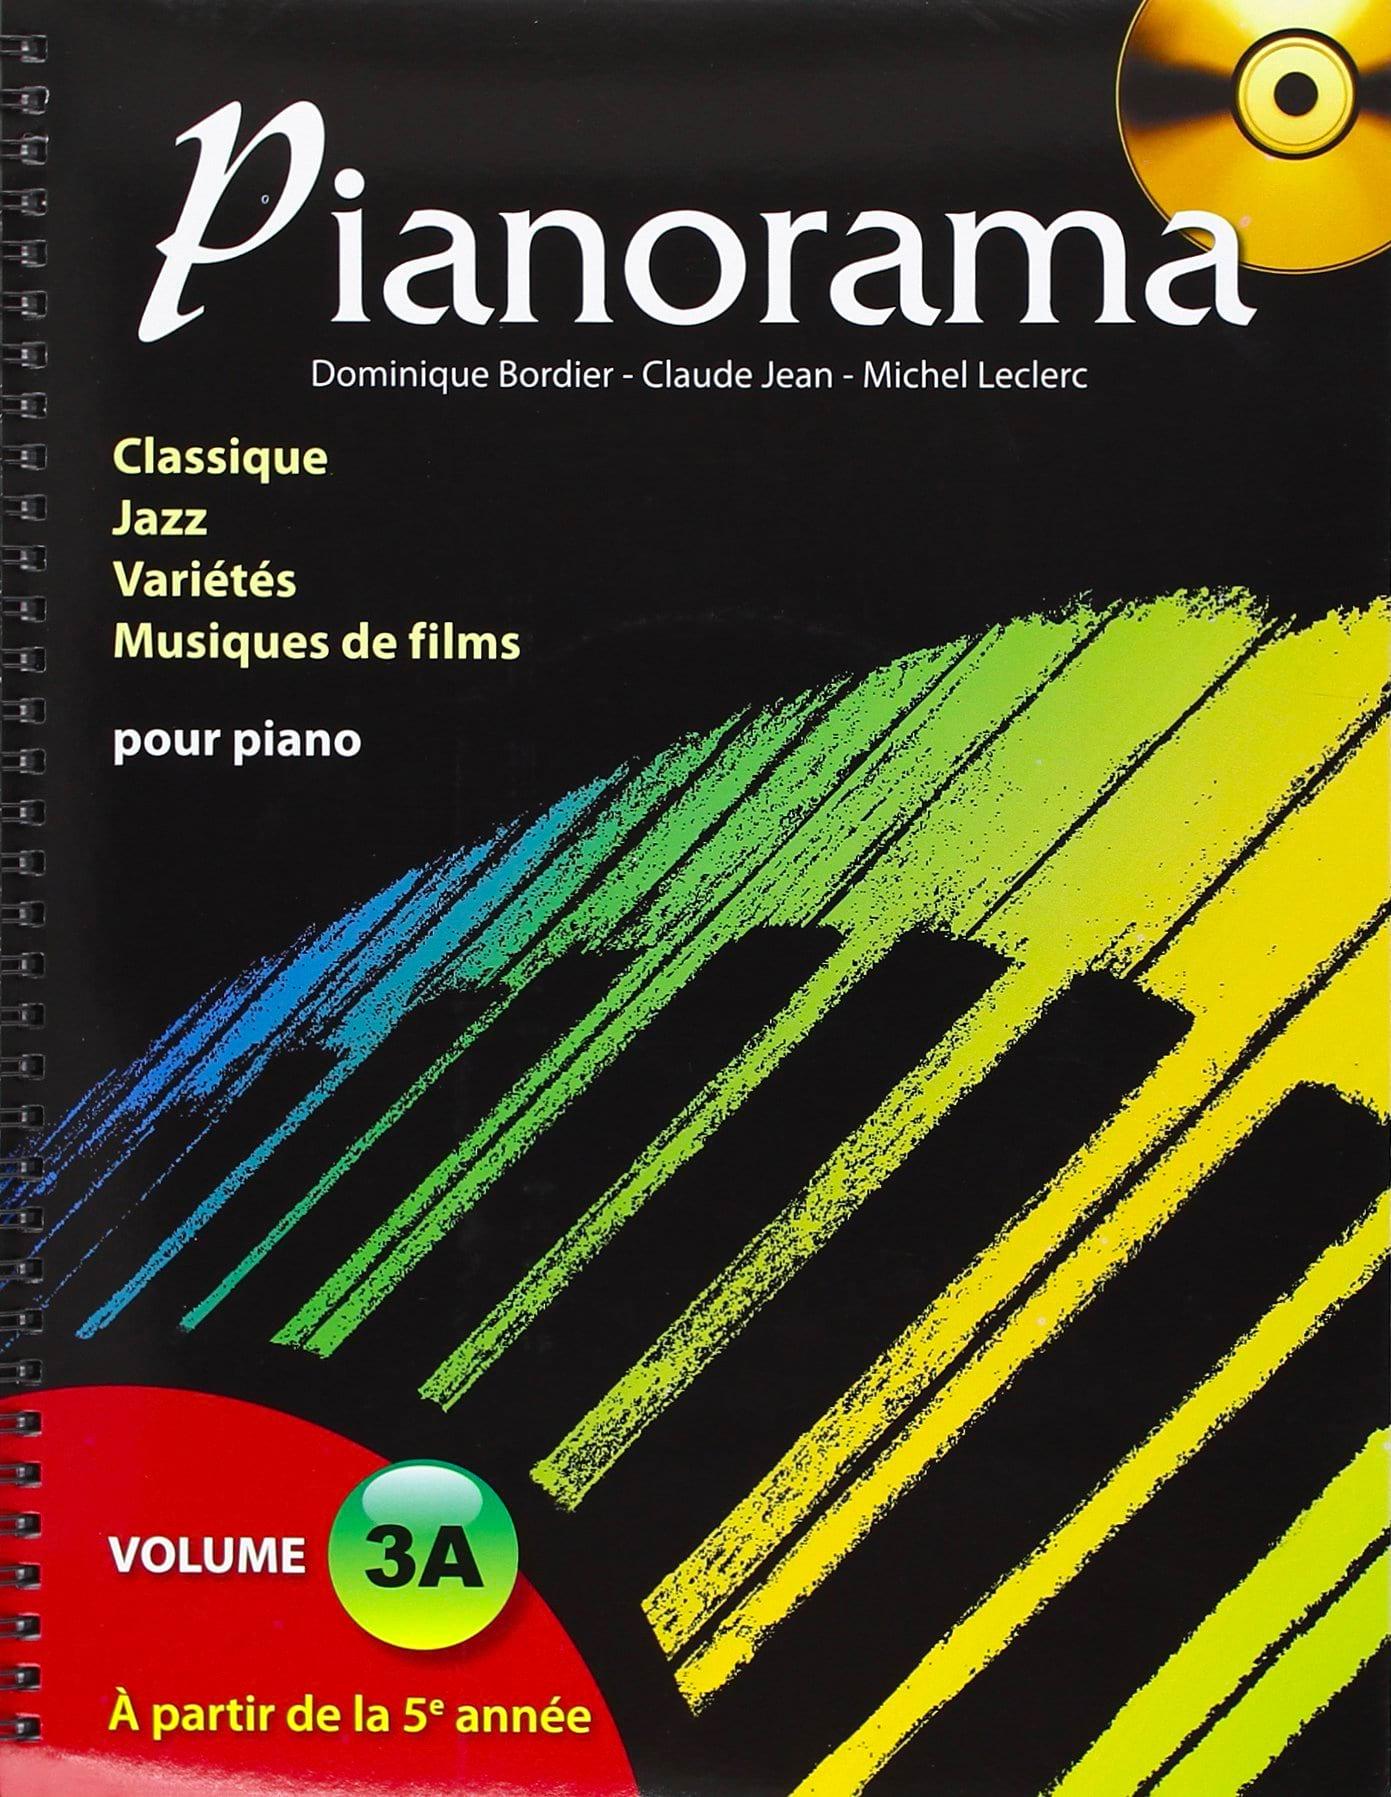 Pianorama 3A - Partition - Piano - laflutedepan.com